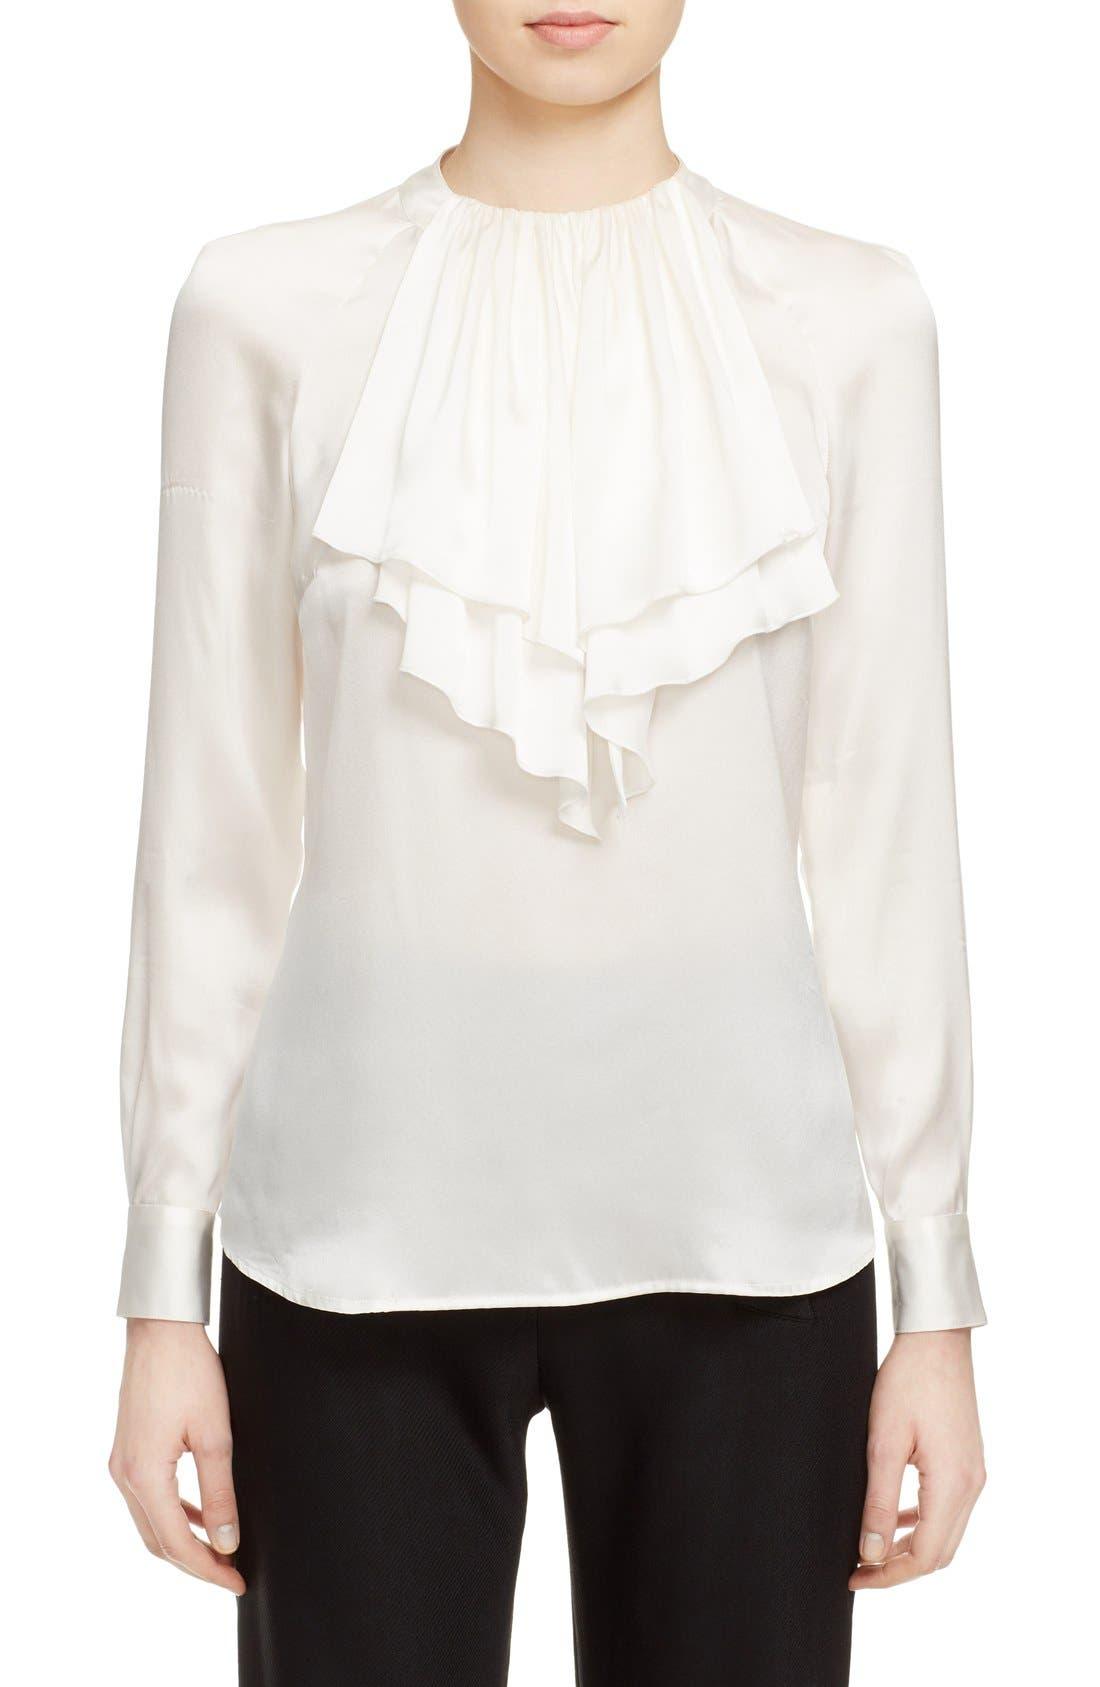 Alternate Image 1 Selected - Veronica Beard 'Riverside' Ruffle Neck Silk Blouse